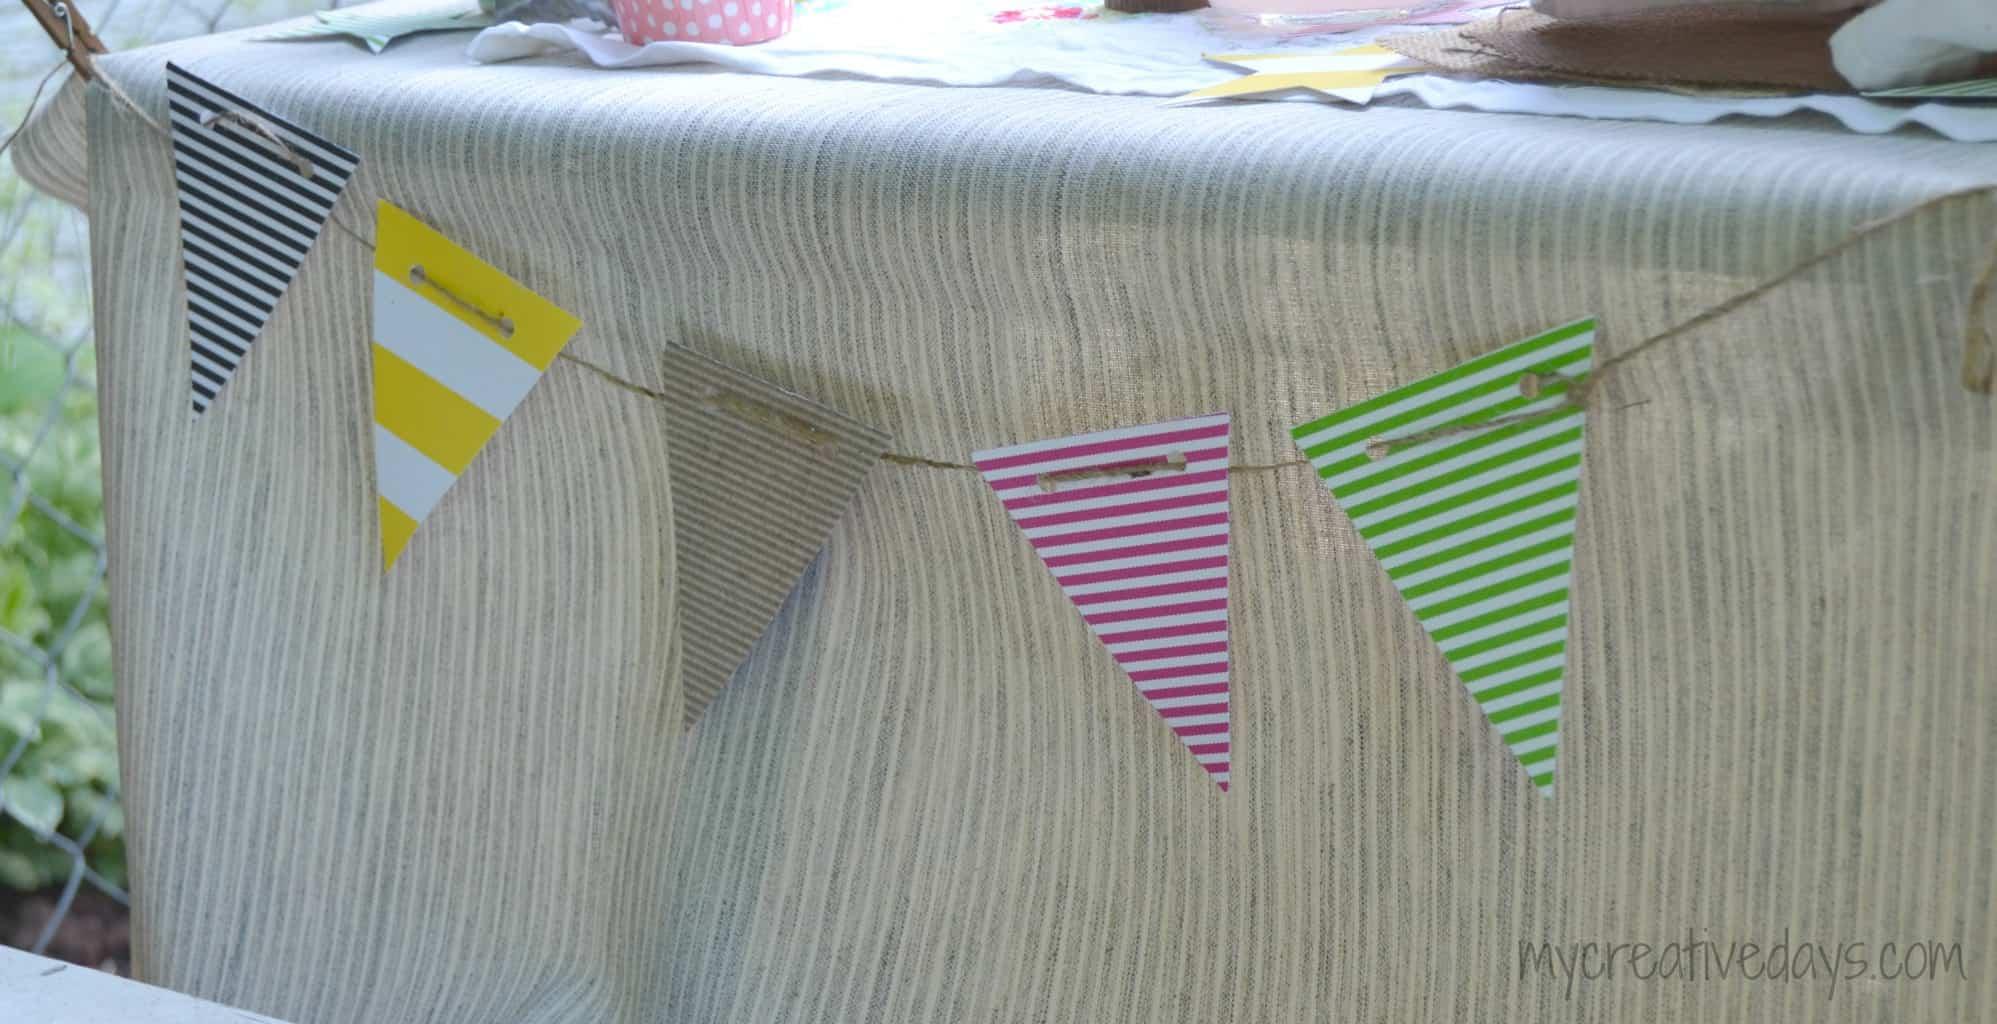 Stars and Stripes Tea Party mycreativedays.com